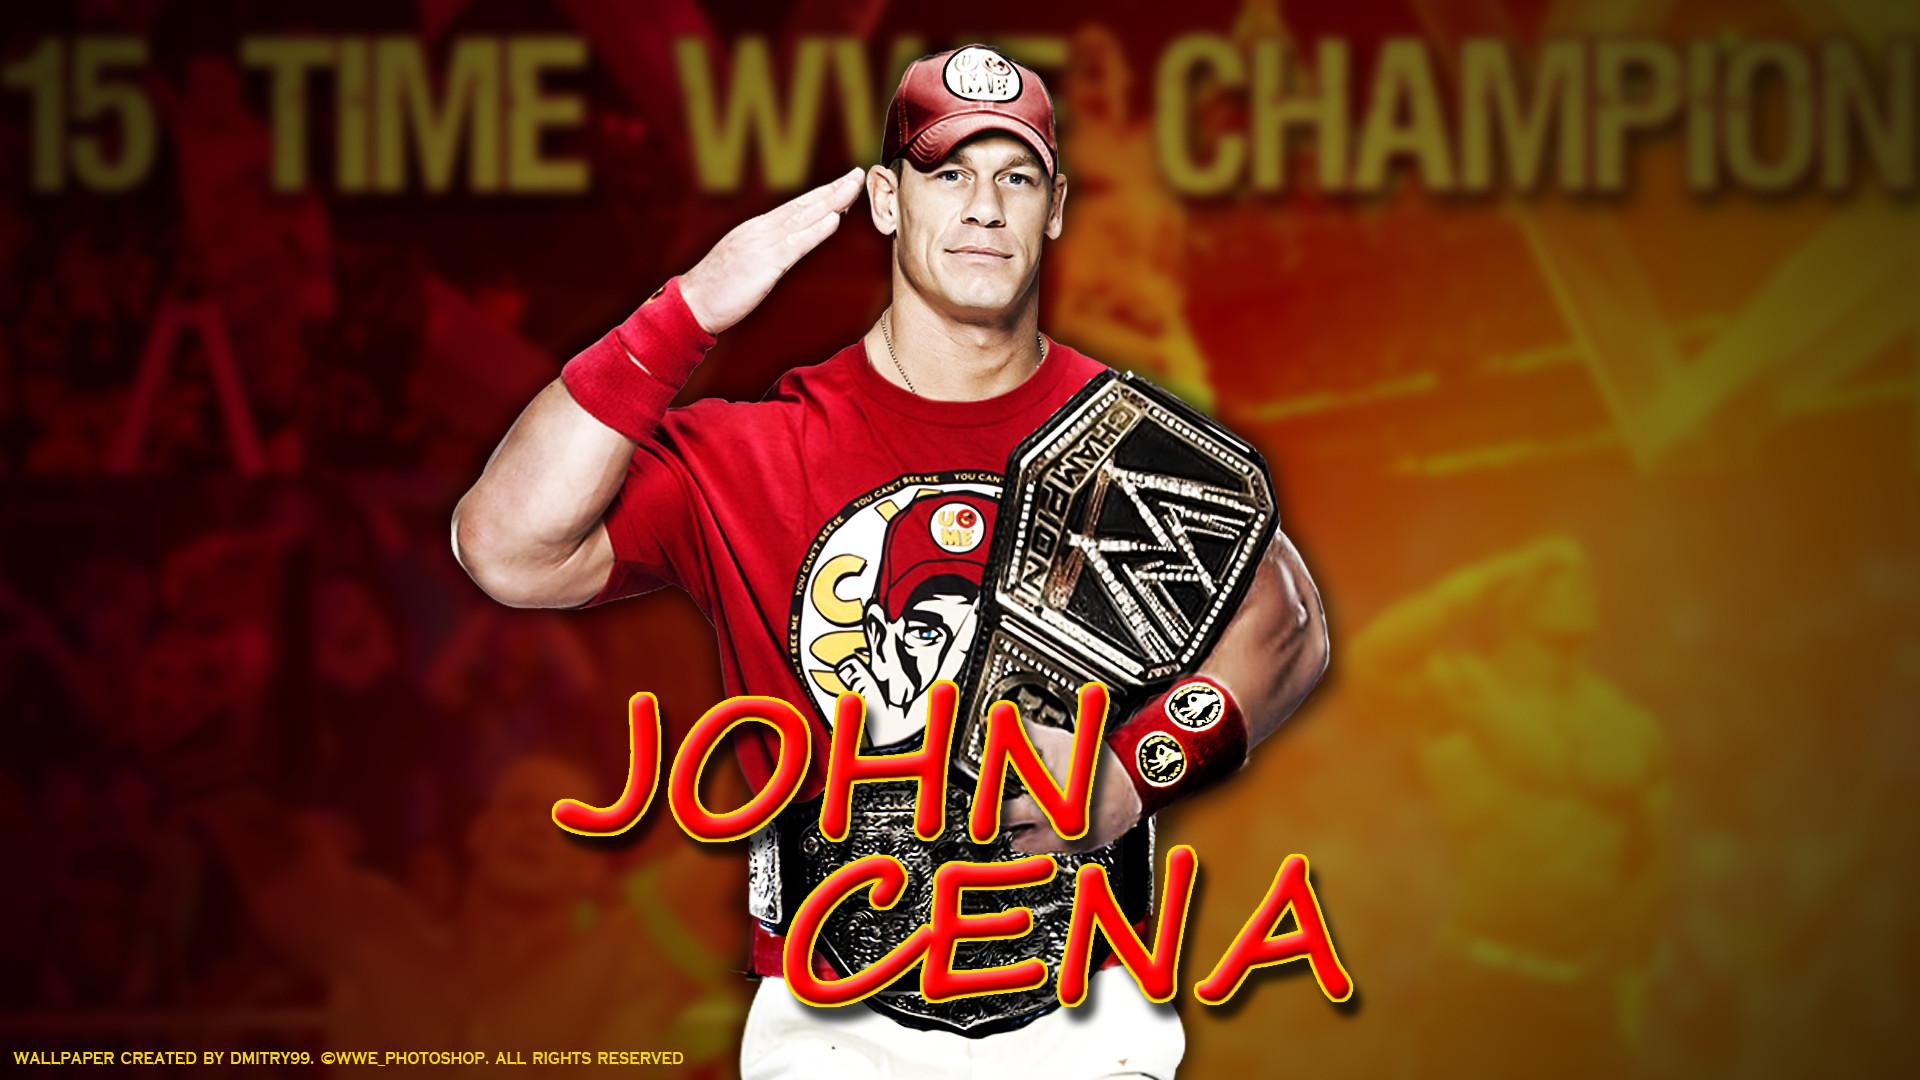 John Cena Wallpapers HD Wallpaper